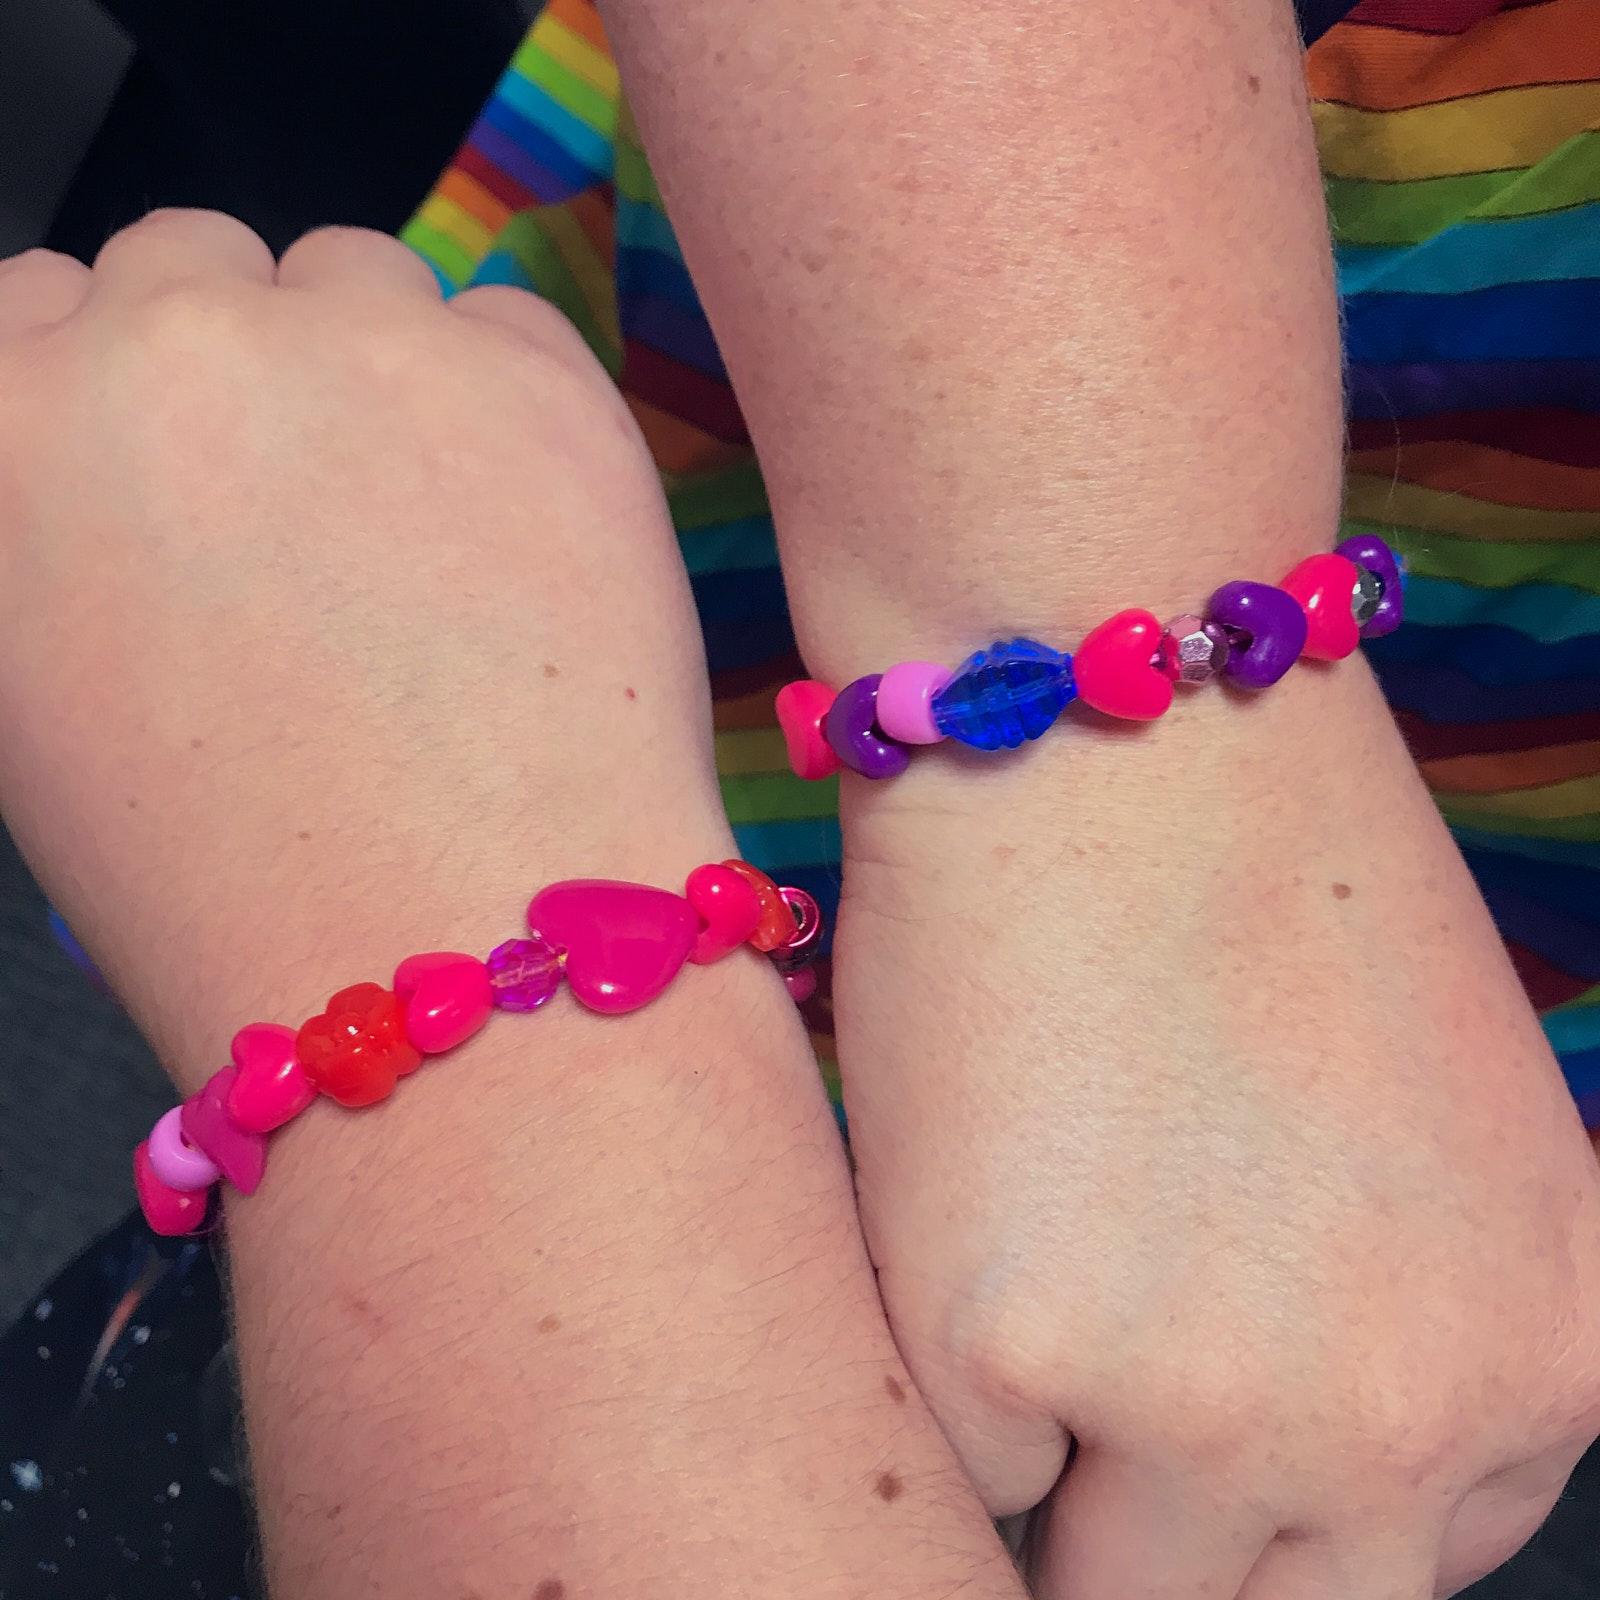 Two bracelets on two wrists